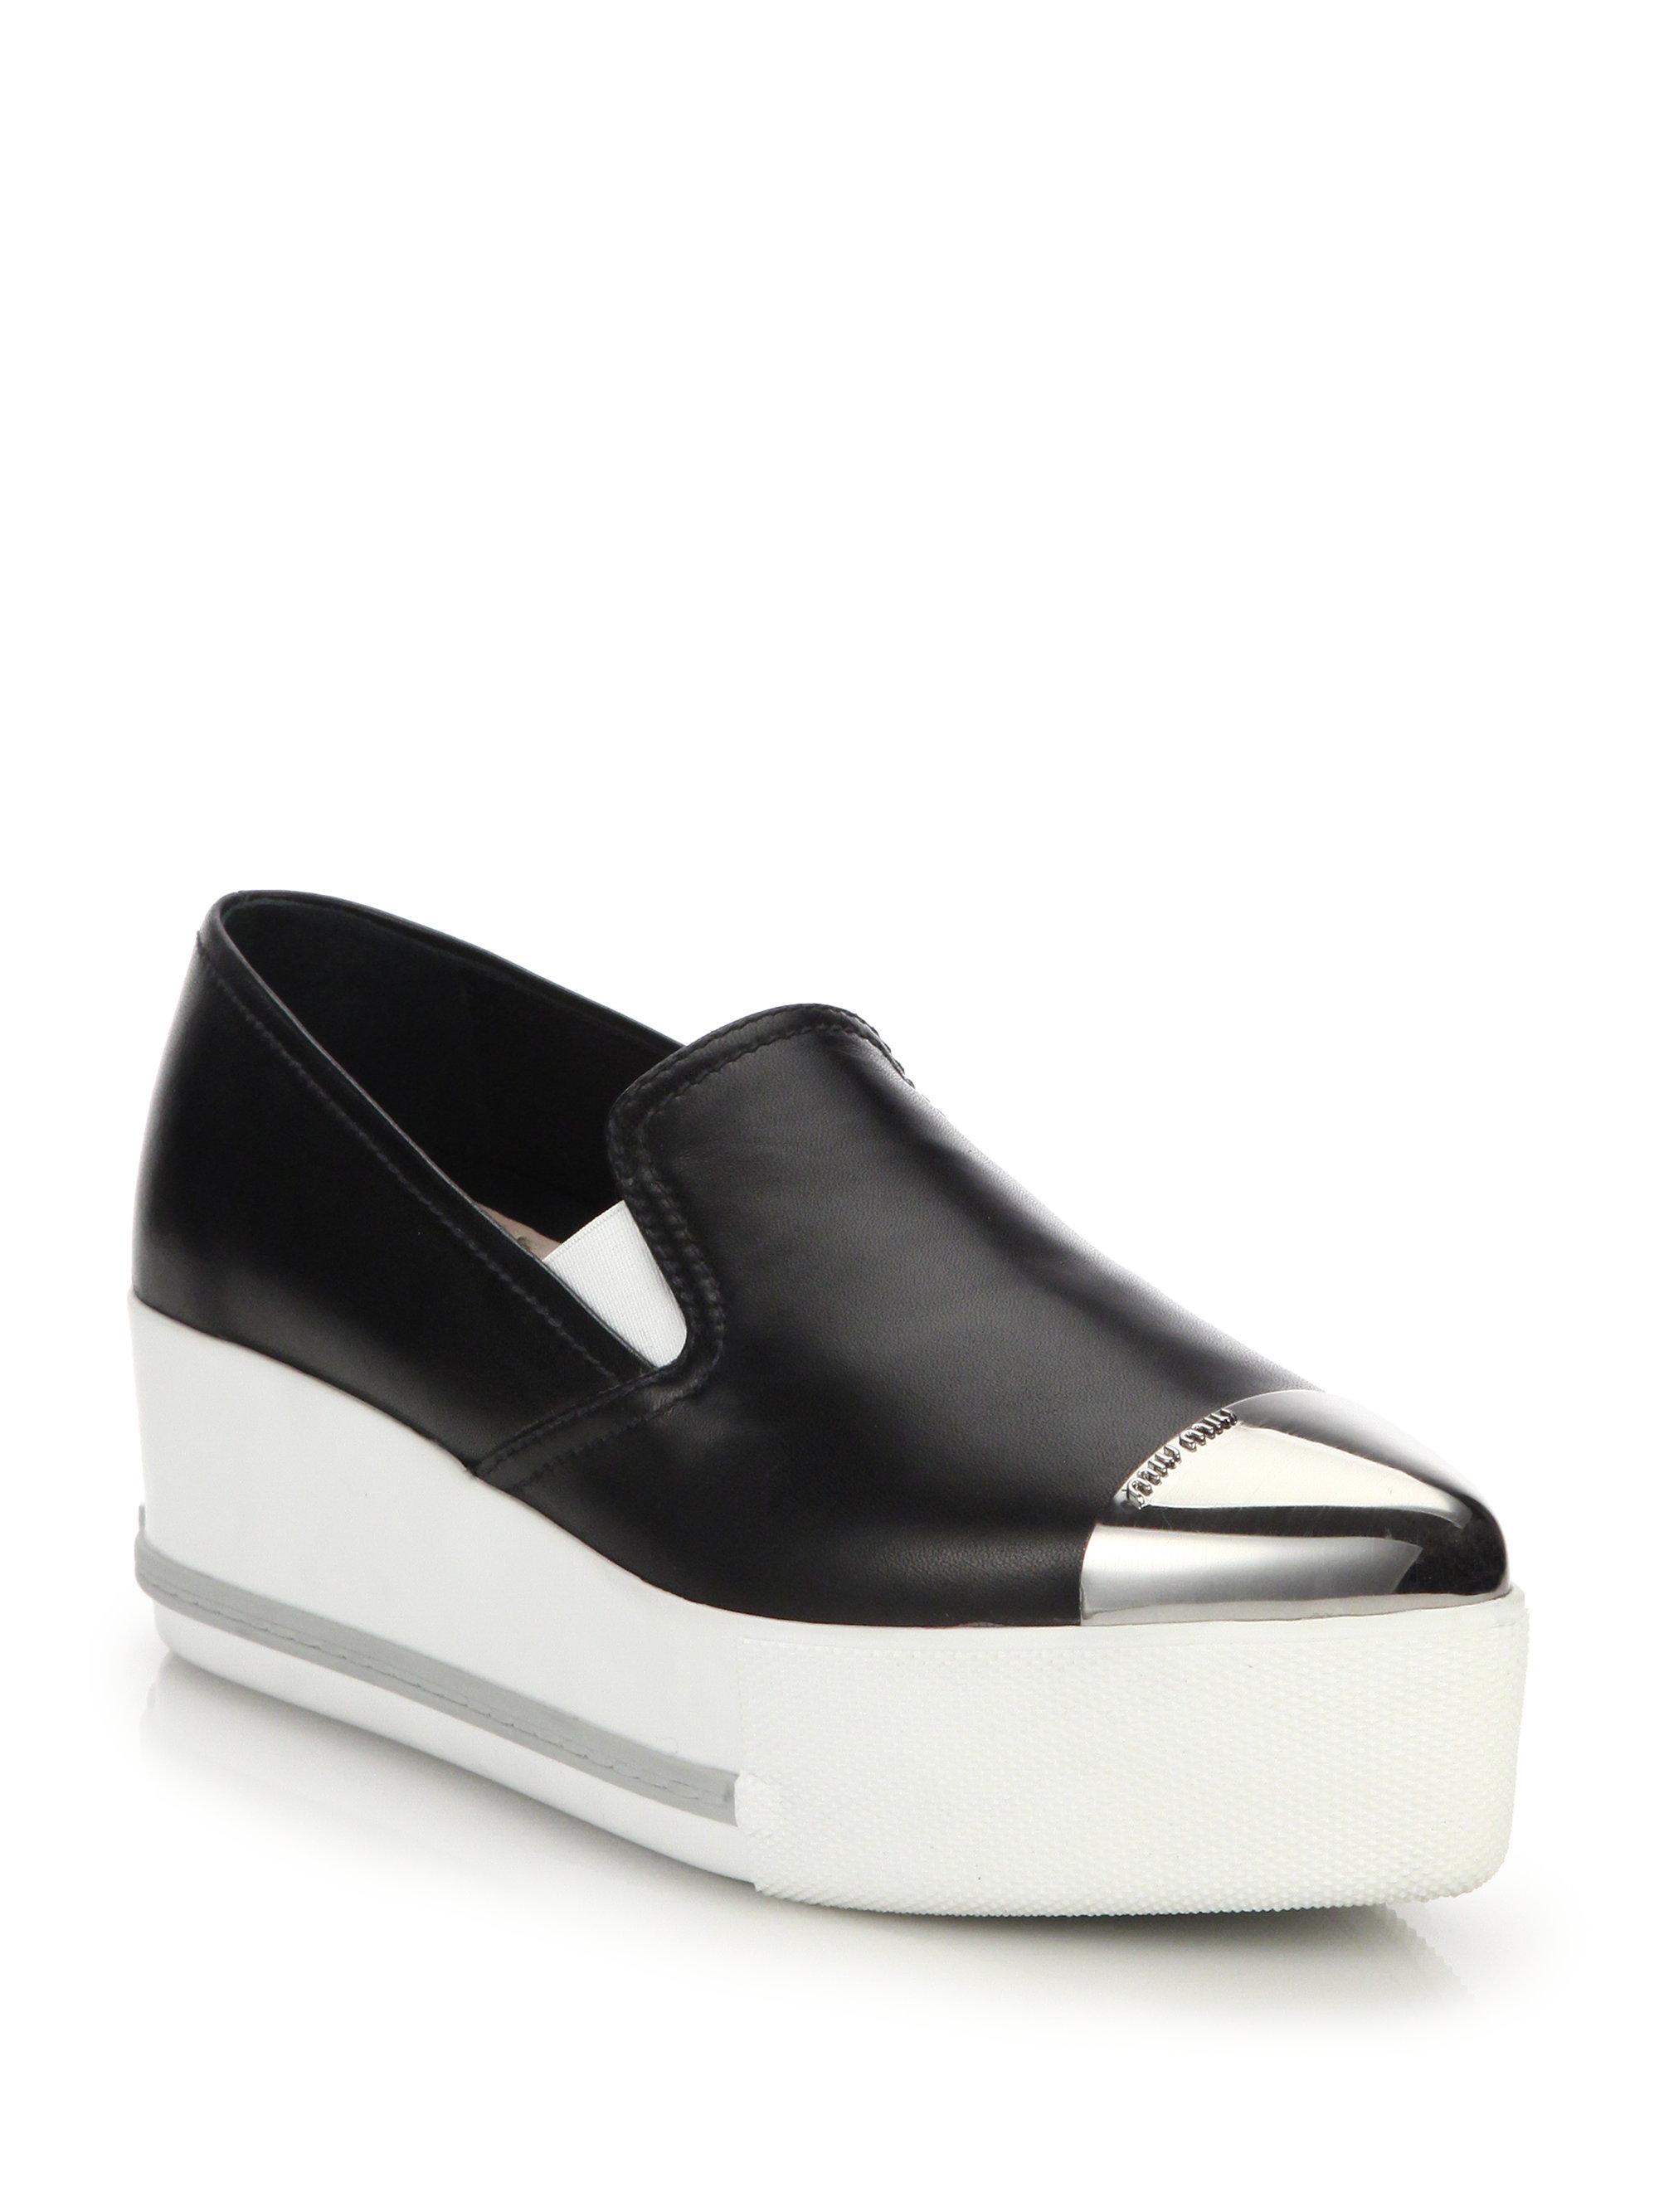 Miu Miu Sale Shoes Uk